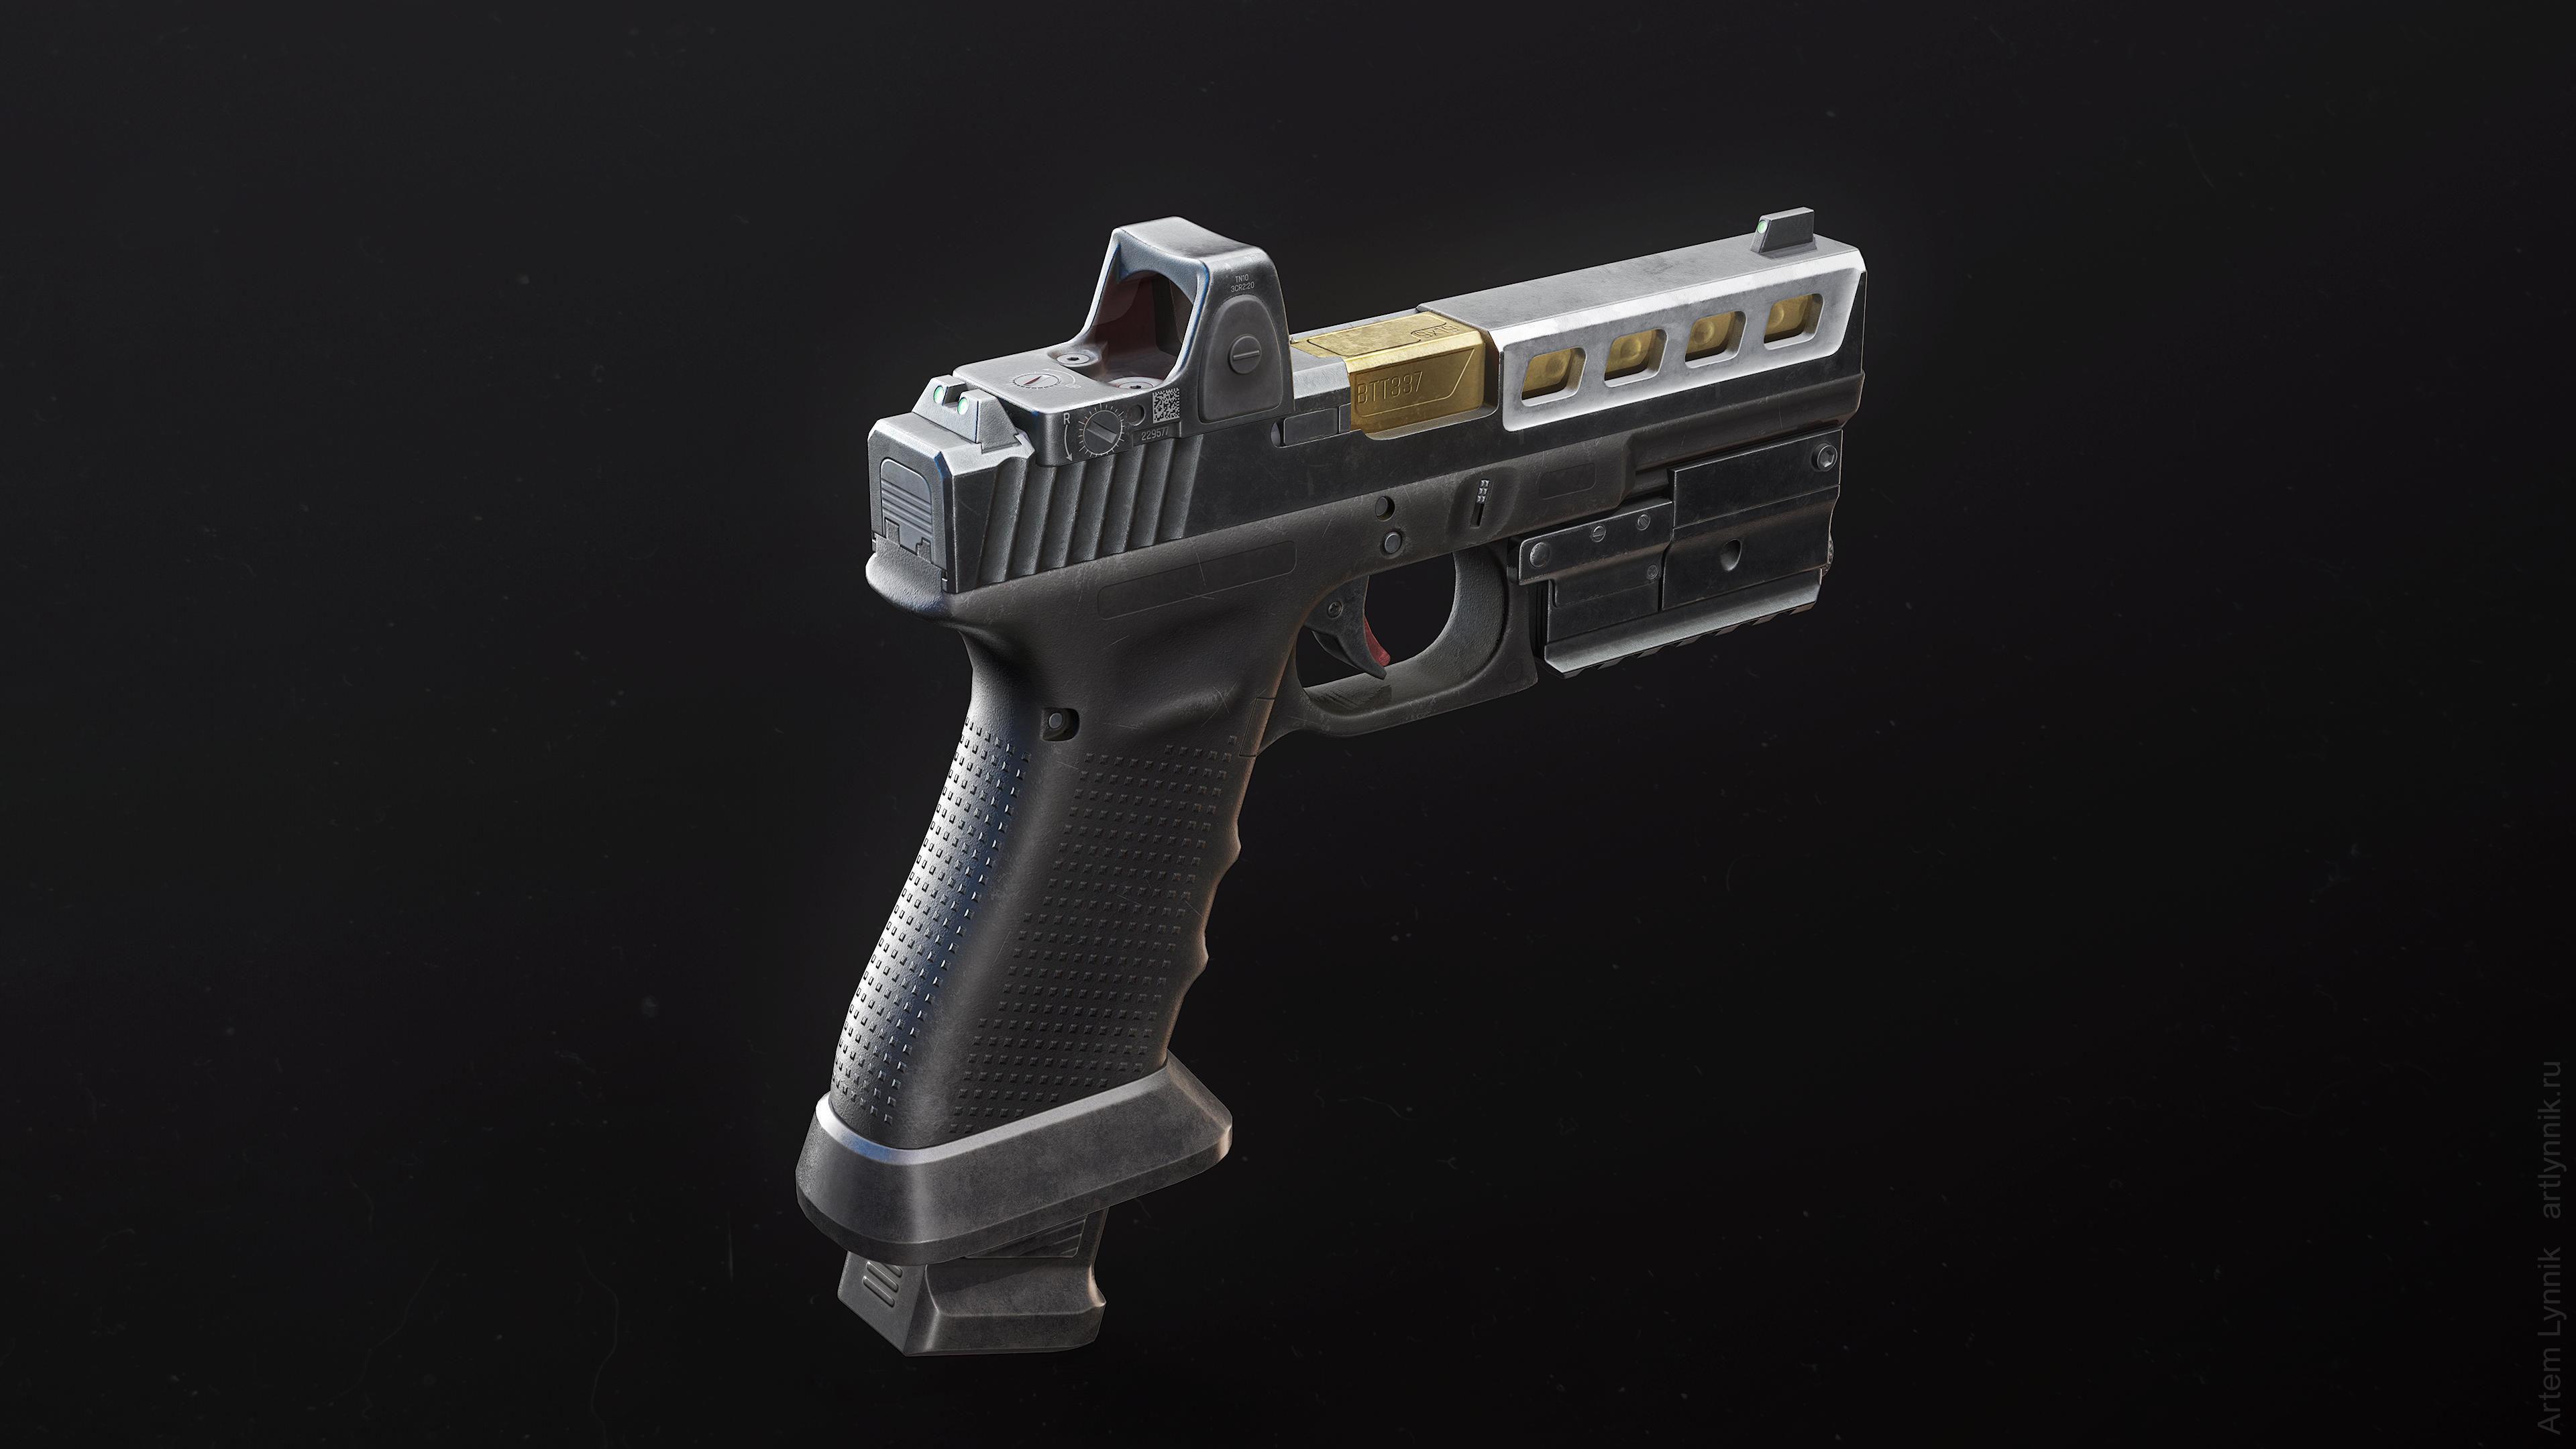 Glock 17 Custom Pistol with Attachments